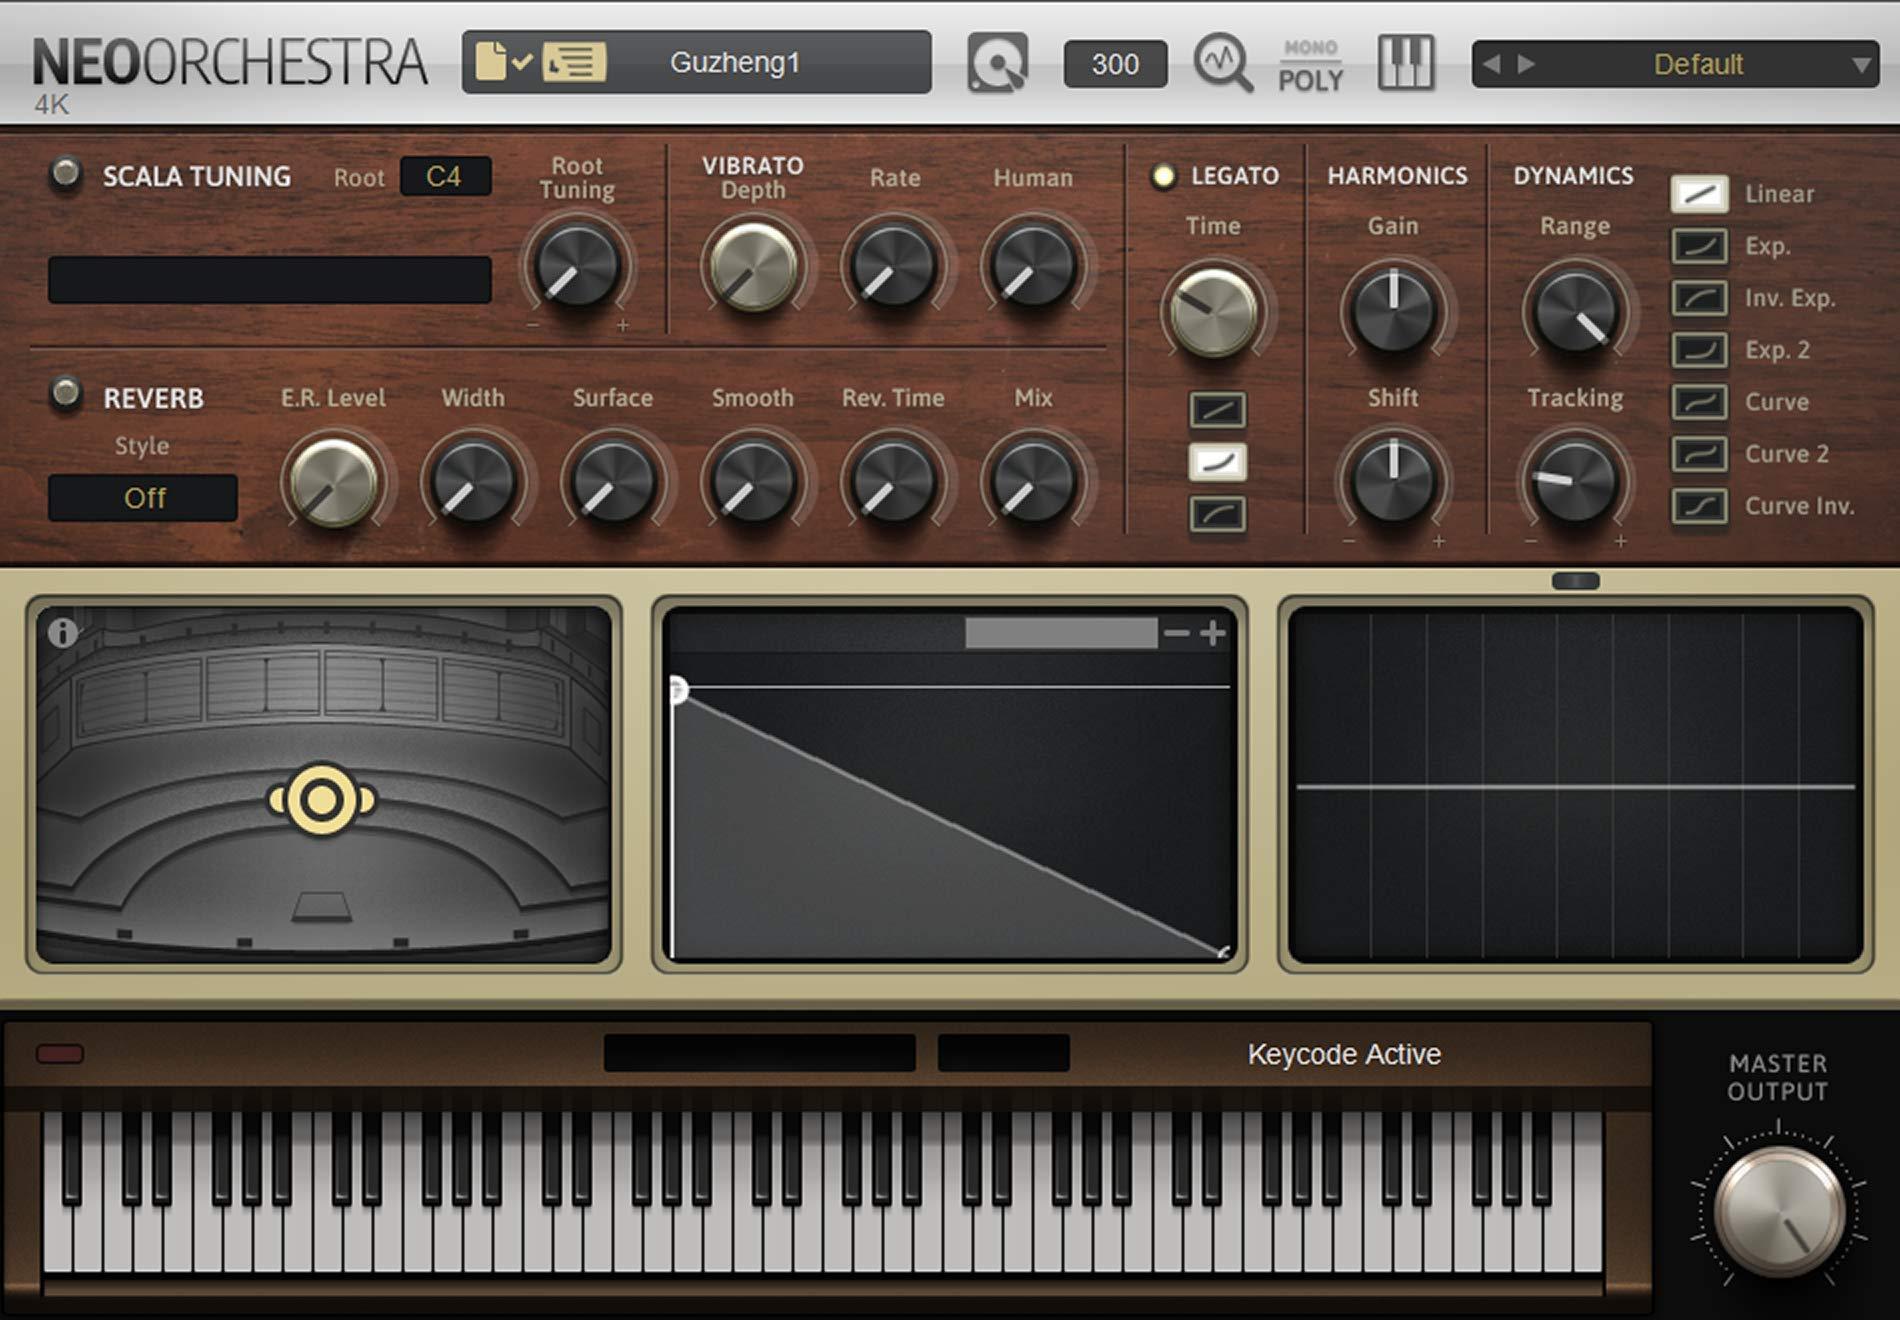 Sound Magic Audio Plug-In V304 by SoundMAGIC